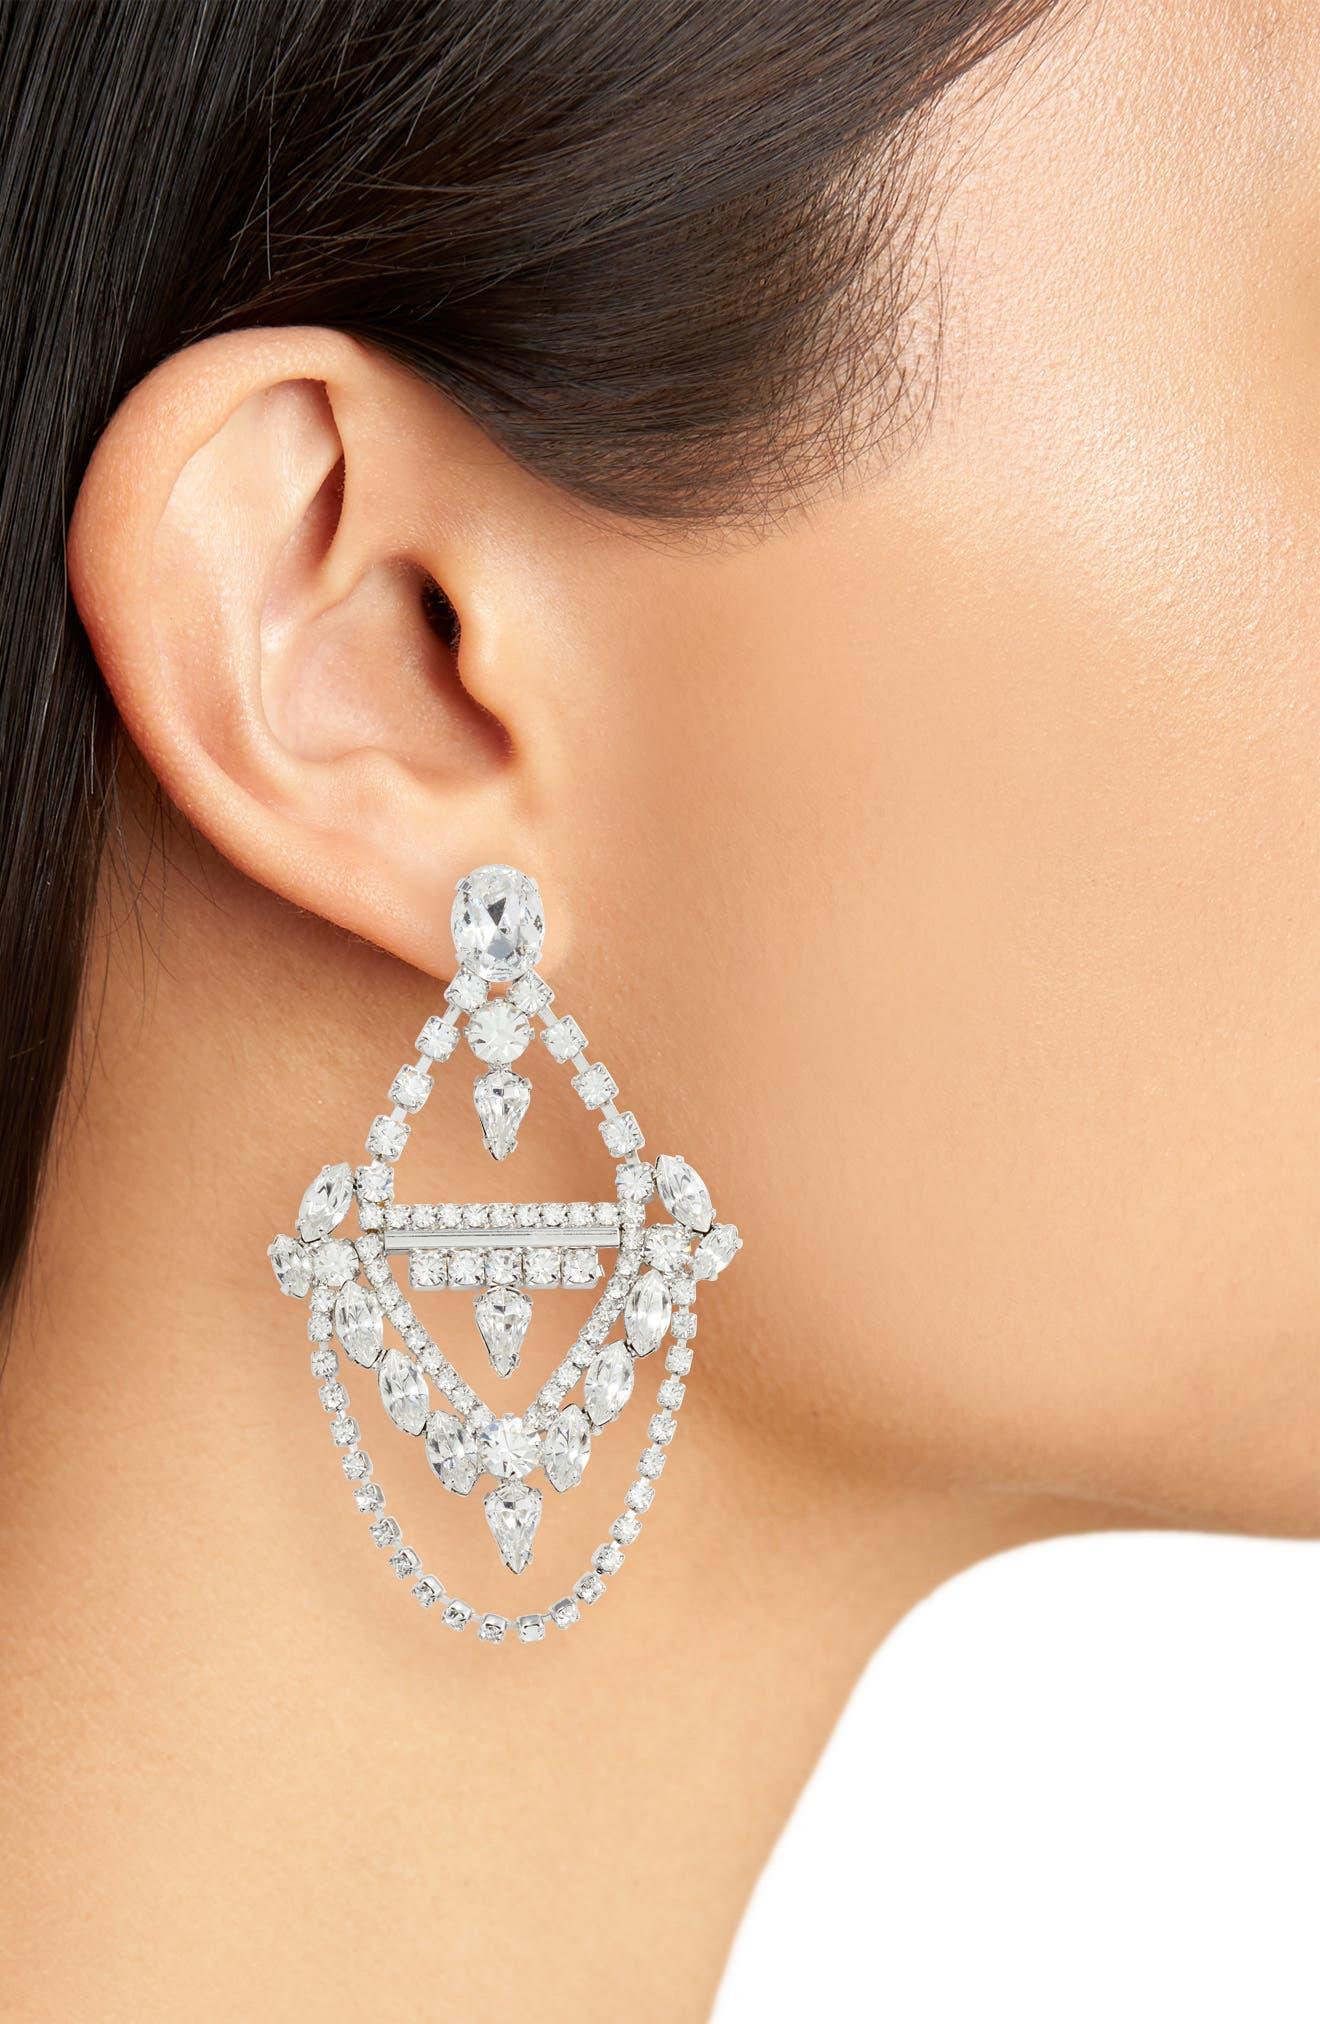 Crystal Chandelier Earrings,                             Alternate thumbnail 2, color,                             Silver